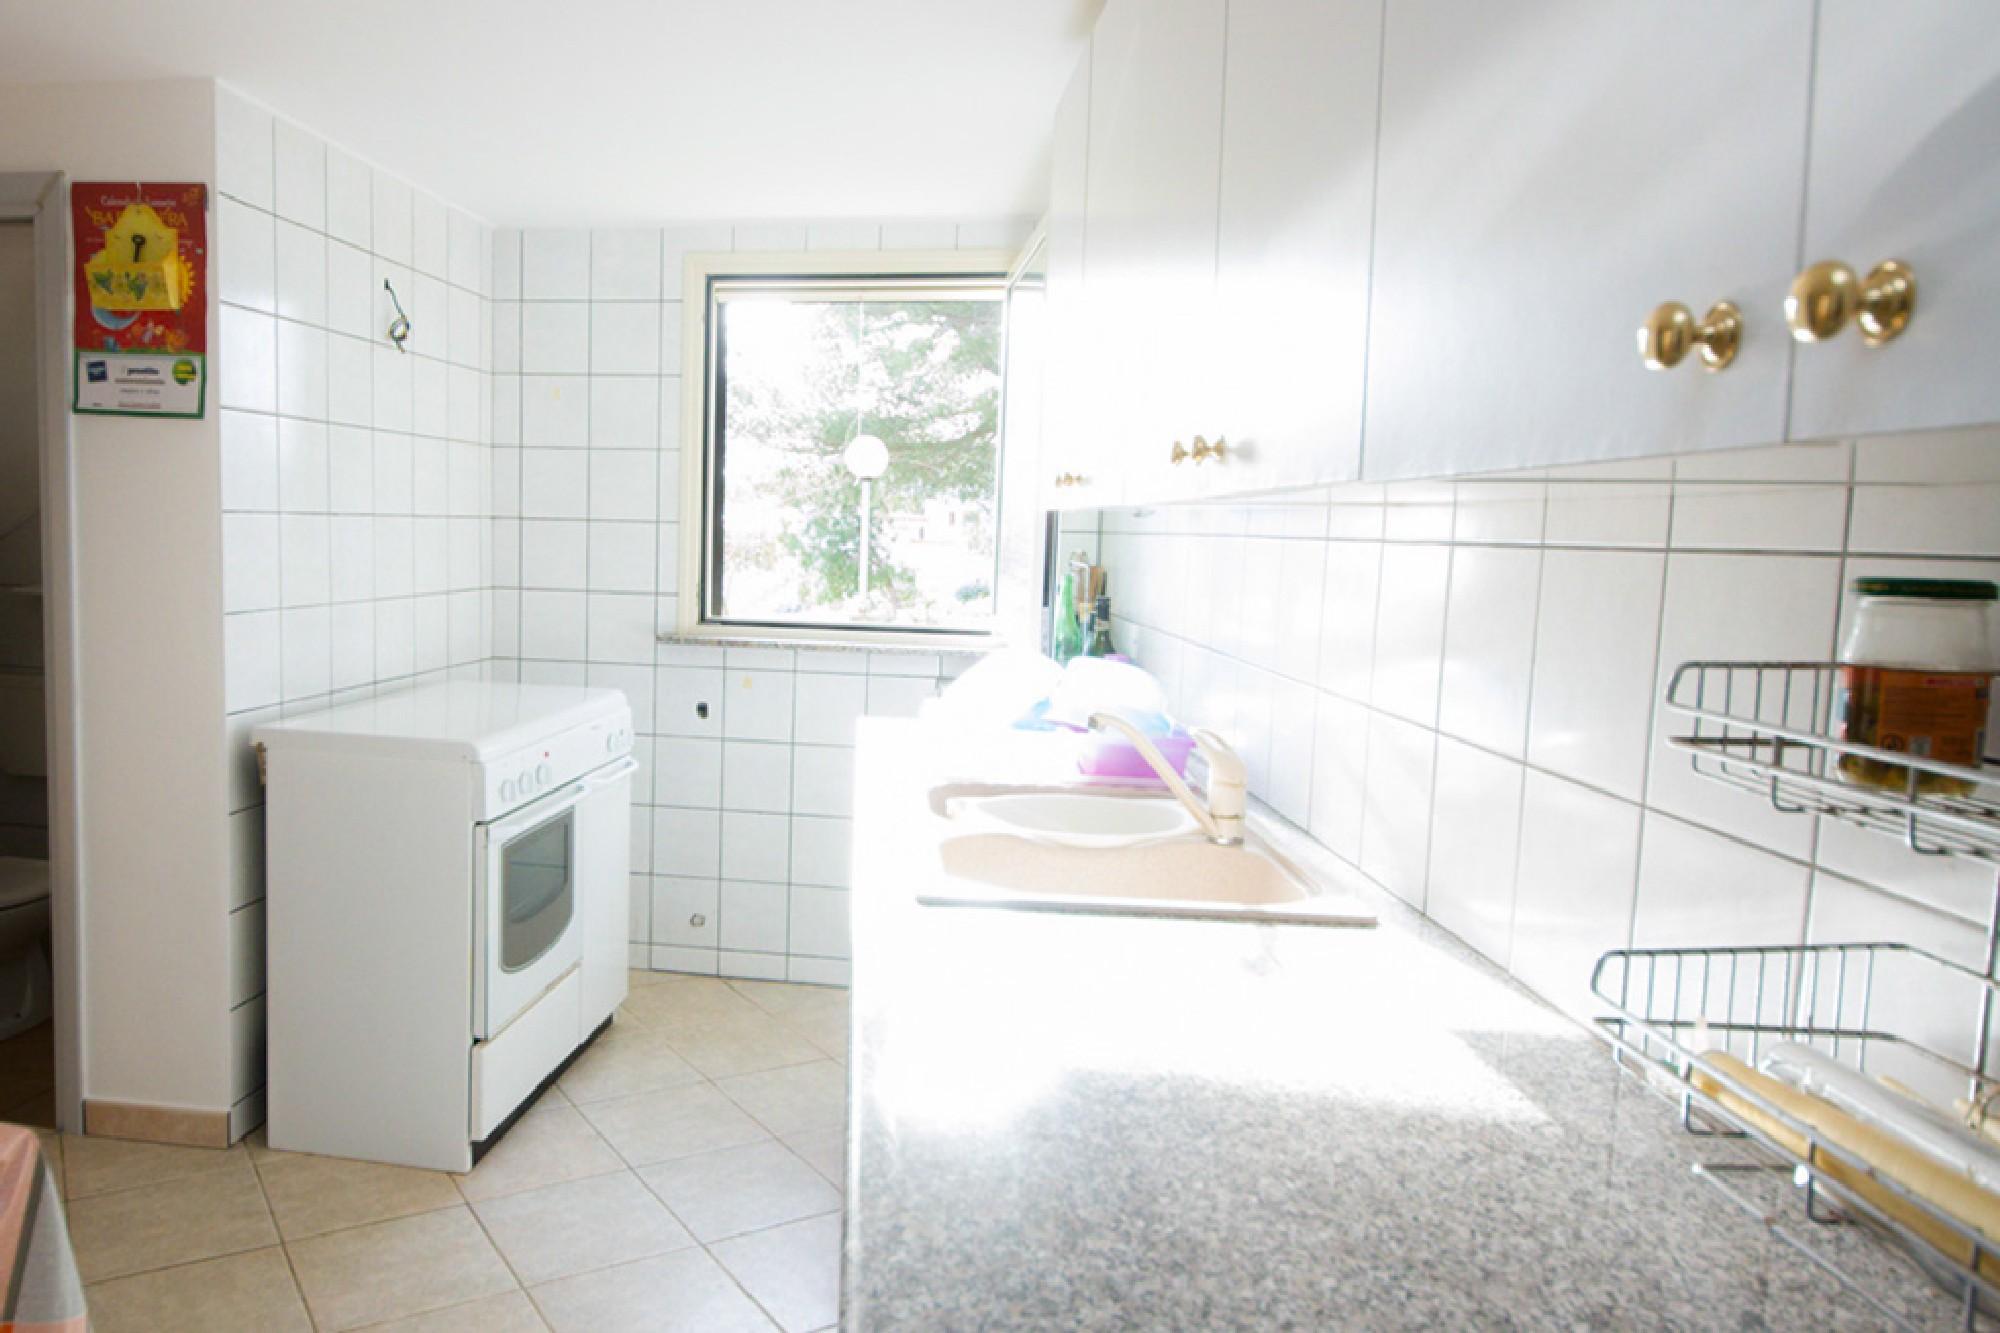 Apartment Apt Porticato 2 - Cantoru photo 24289667